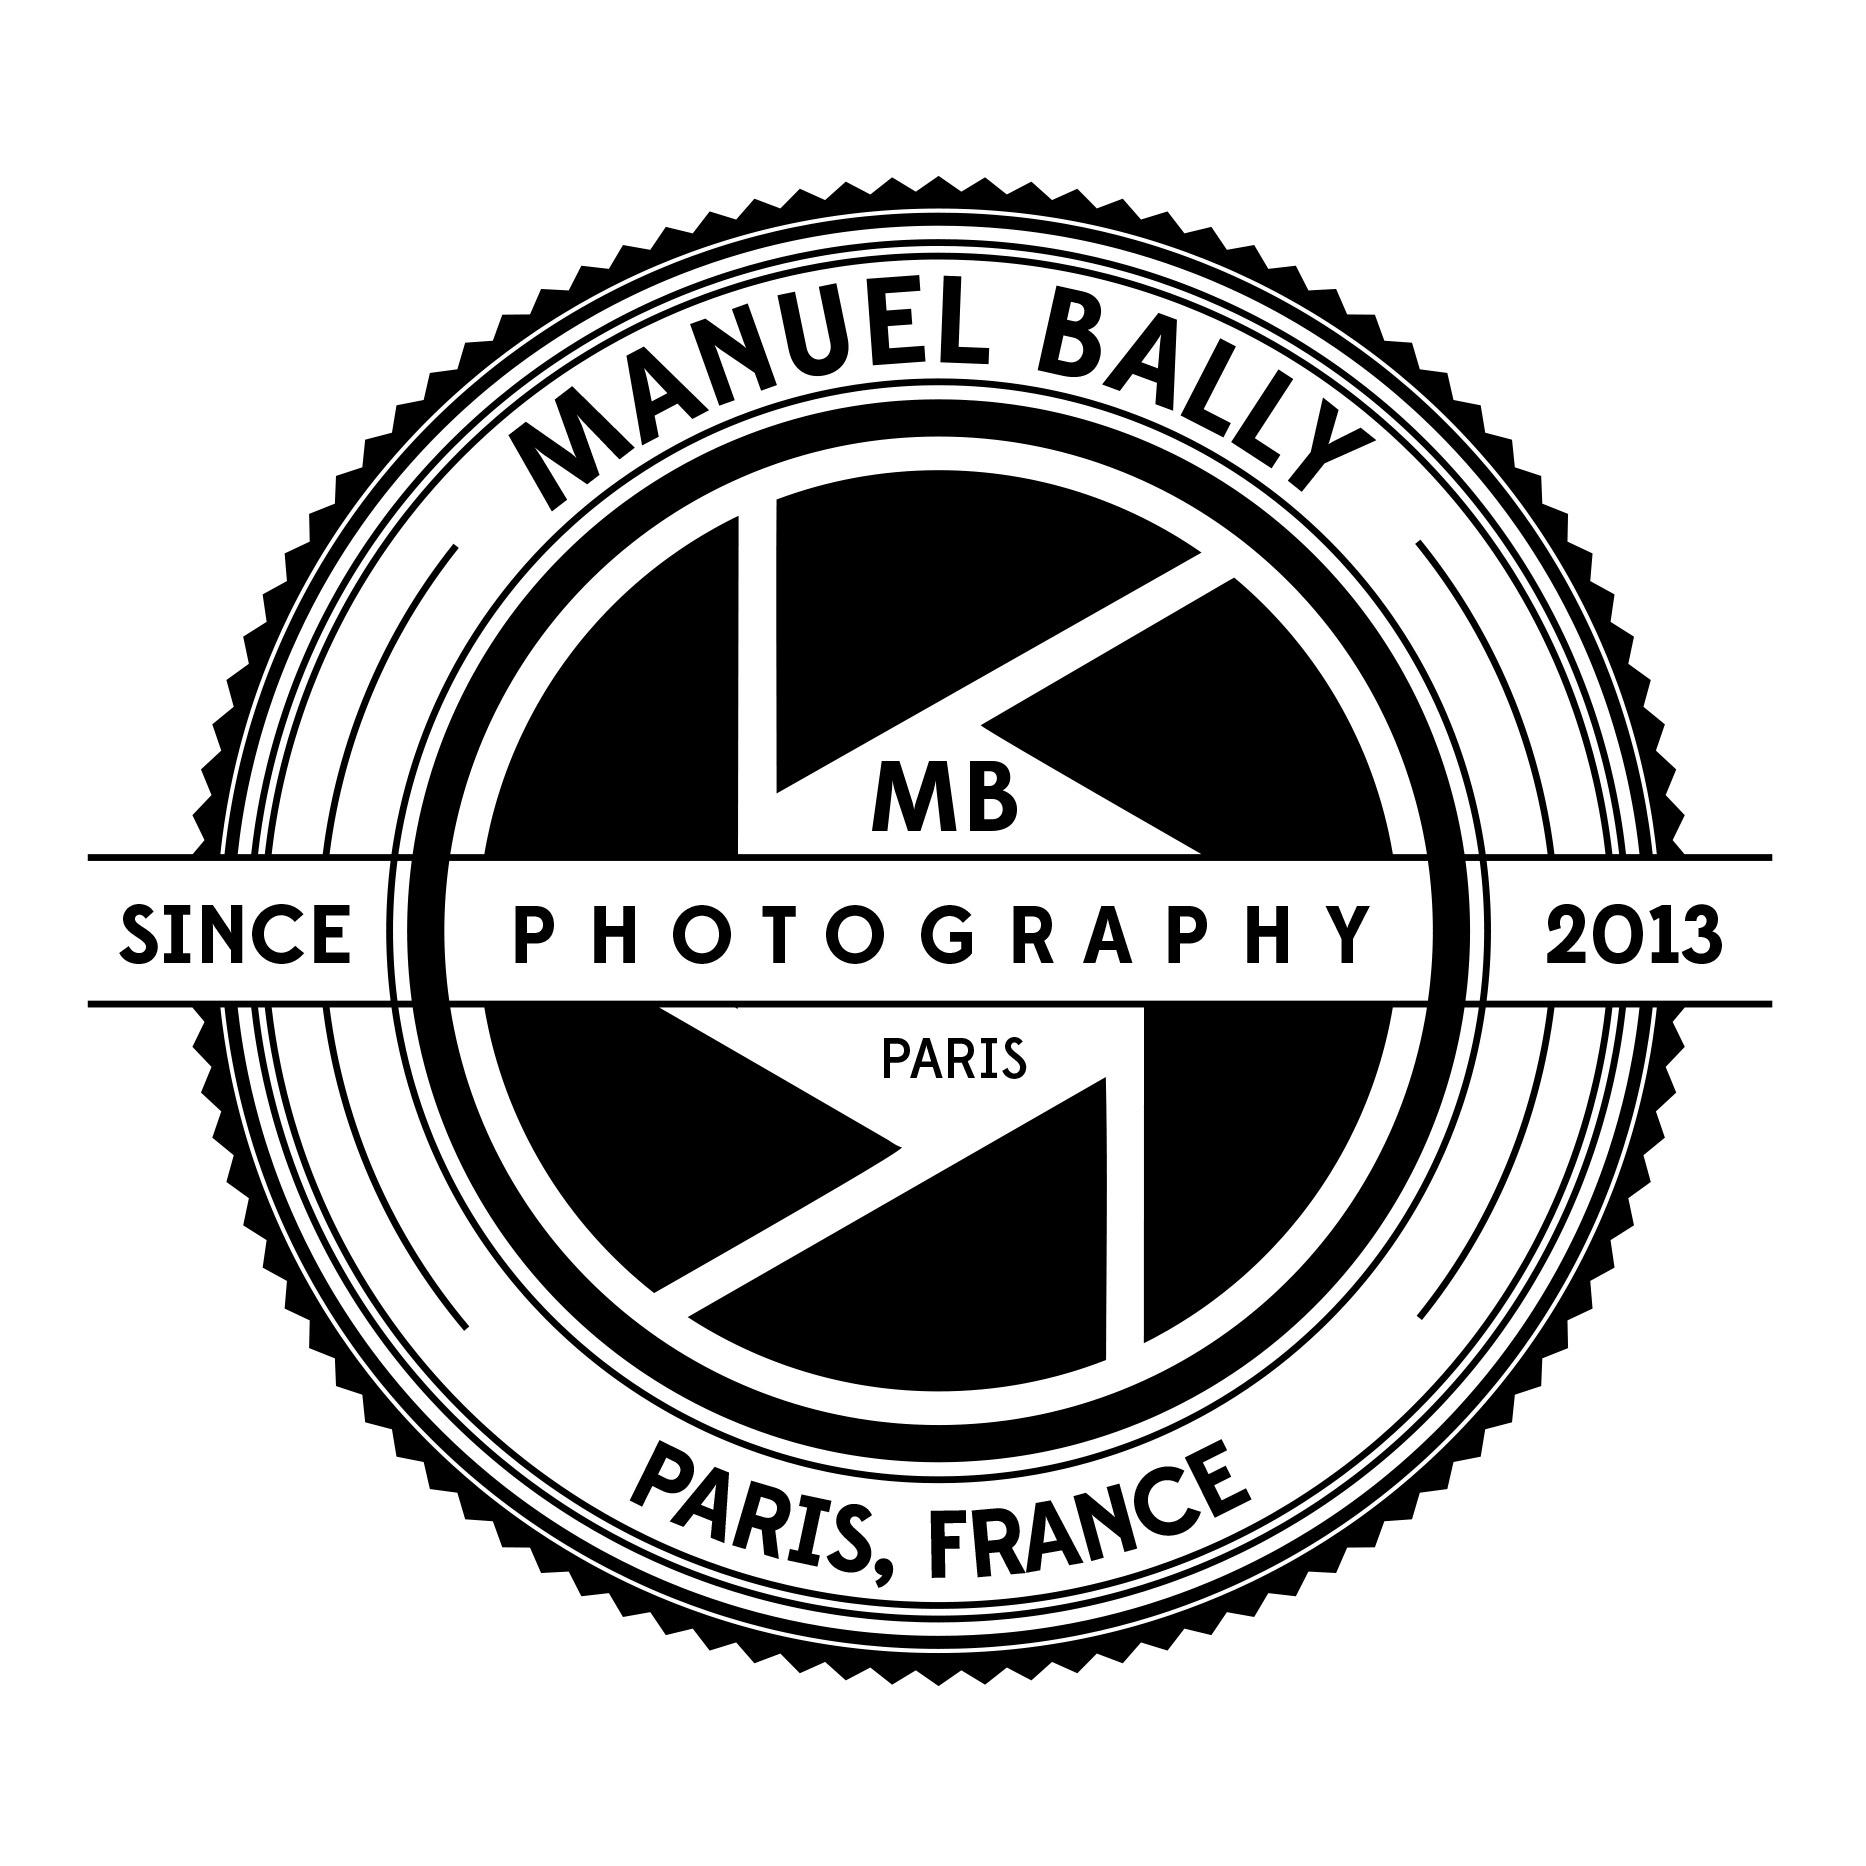 Manuel Bally